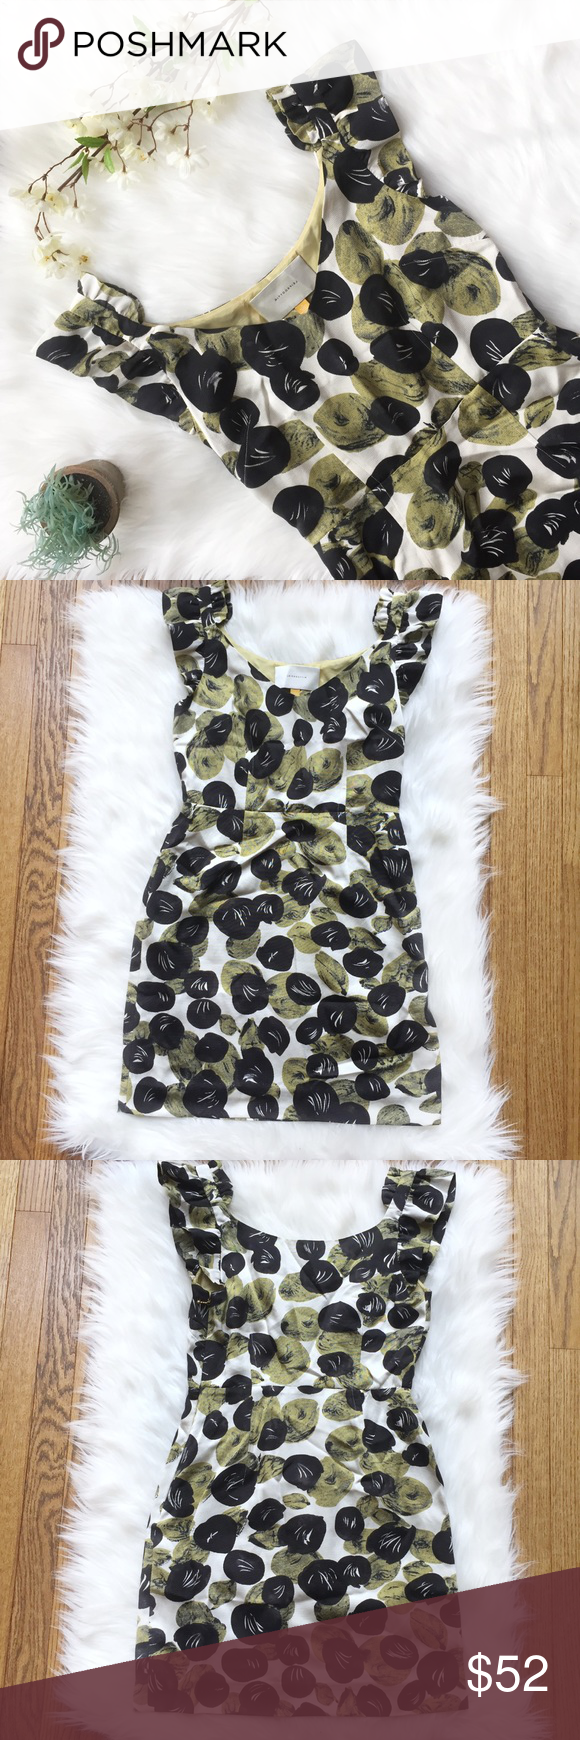 Anthropologie Leifsdottir Silk Blend Leaf Dress Pattern White Dress Lace Trim Skirts Clothes Design